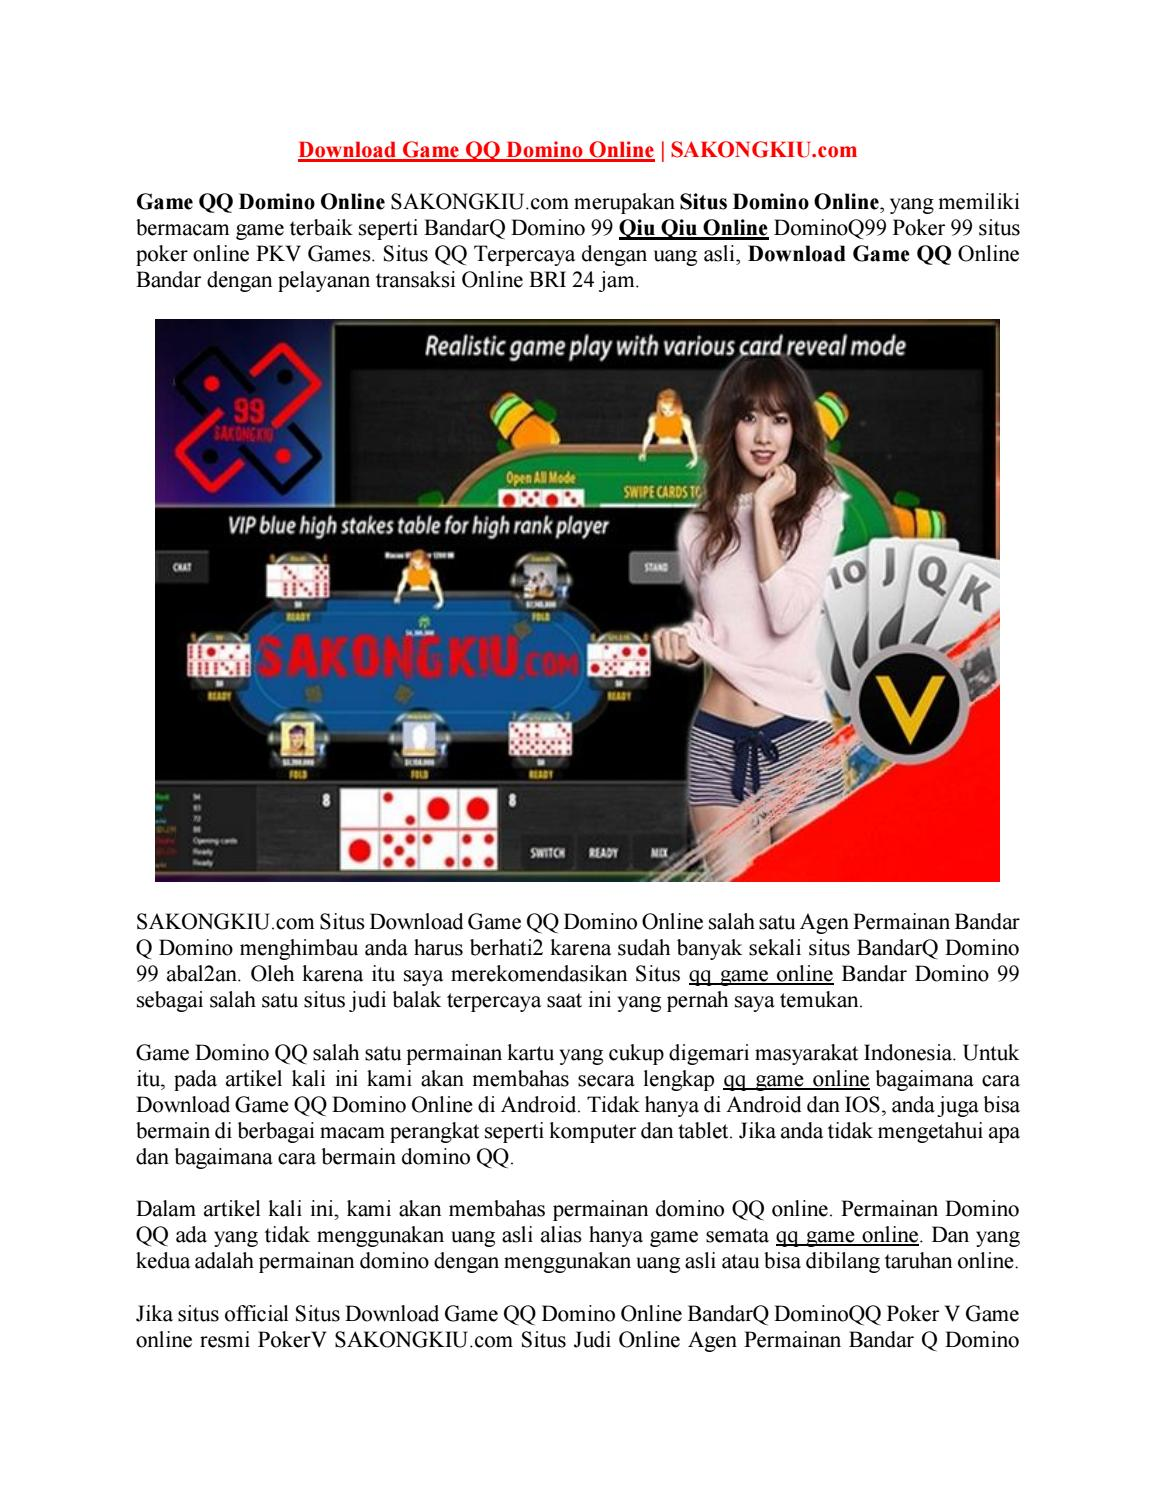 Download Game Qq Domino Online Sakongkiu Com By Poker Domino 99 Issuu